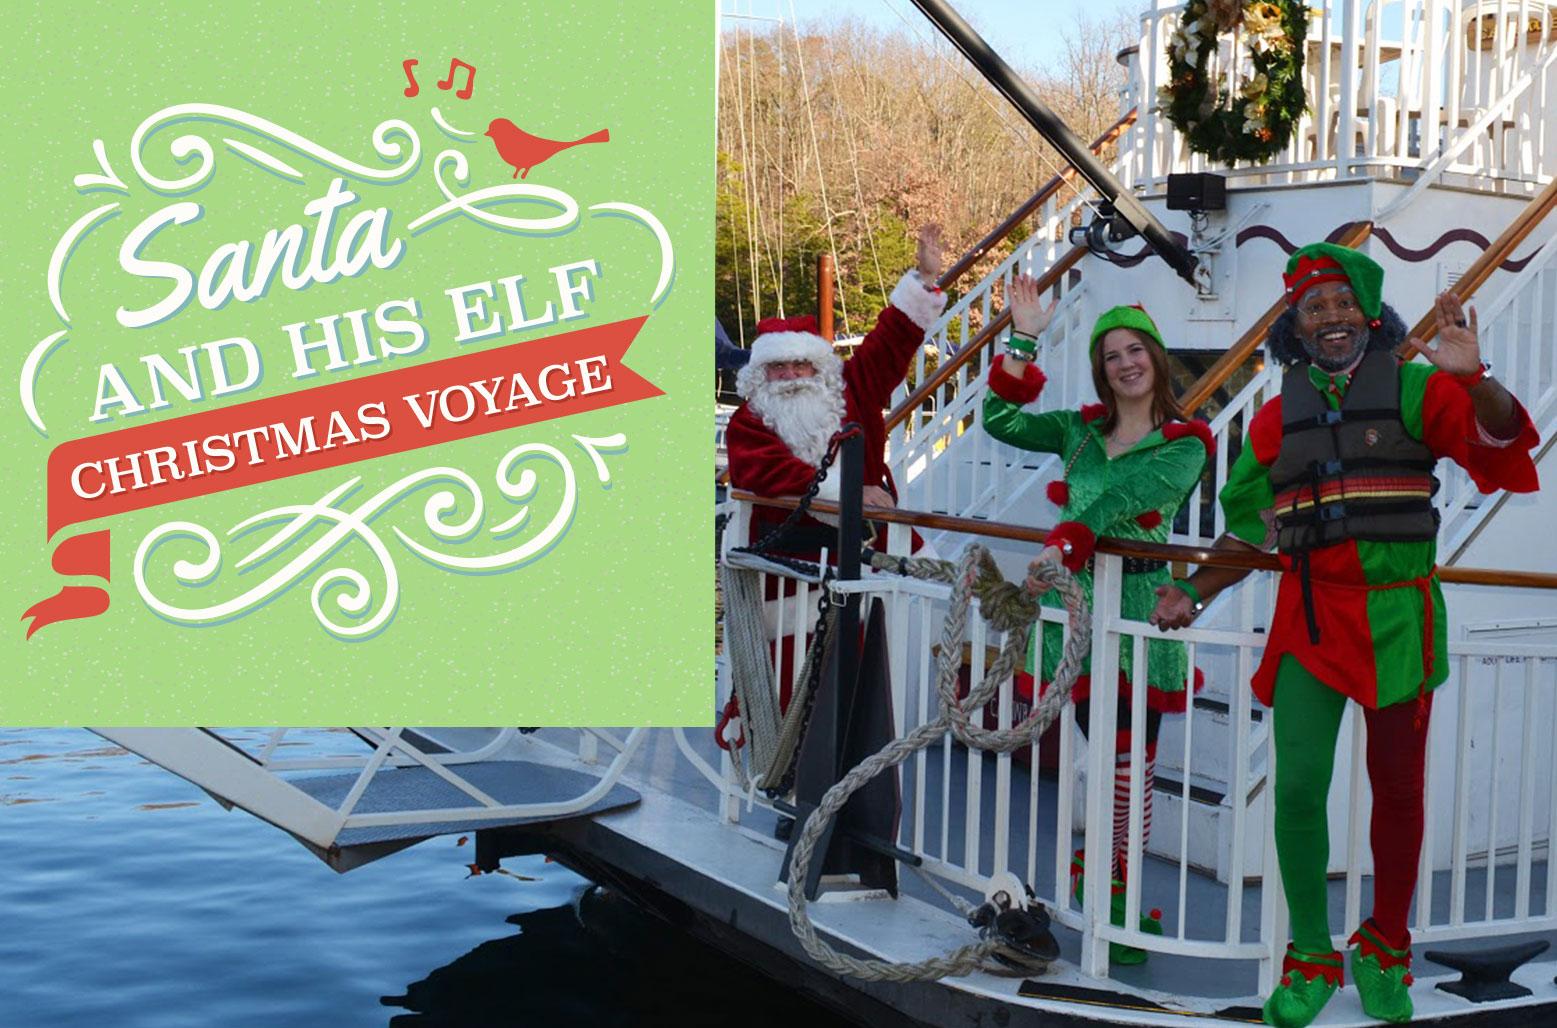 Christmas Voyage